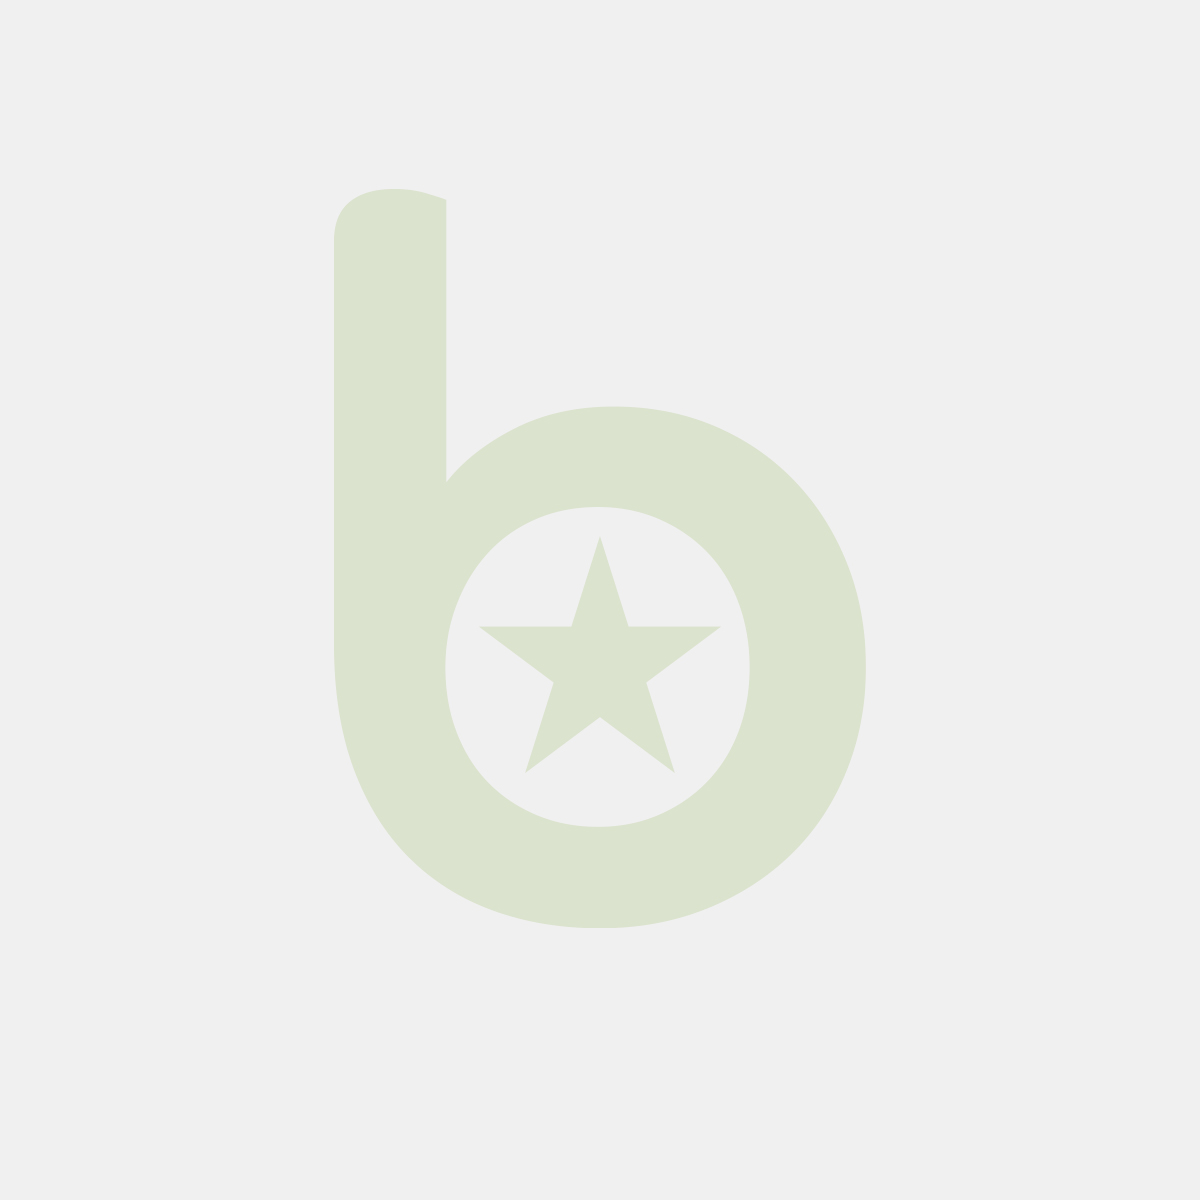 FINGERFOOD - patyczki 9cm CUBE op. 100 sztuk